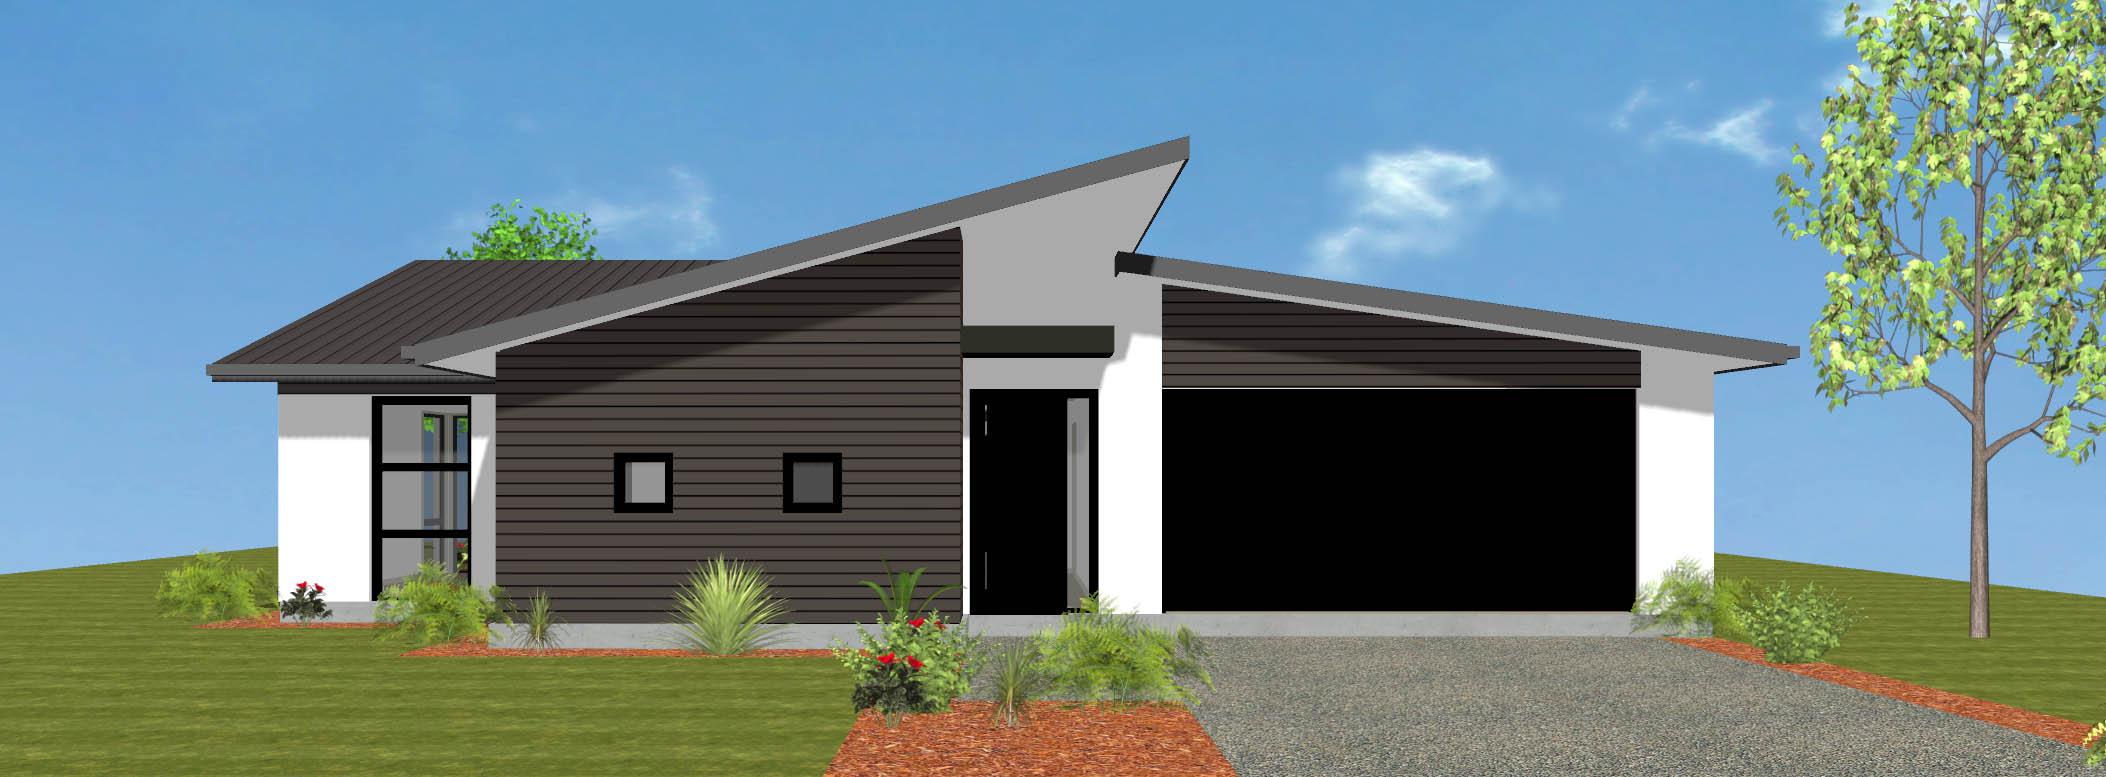 Charleston new house plan and design wellington kapiti for Wellington house designs